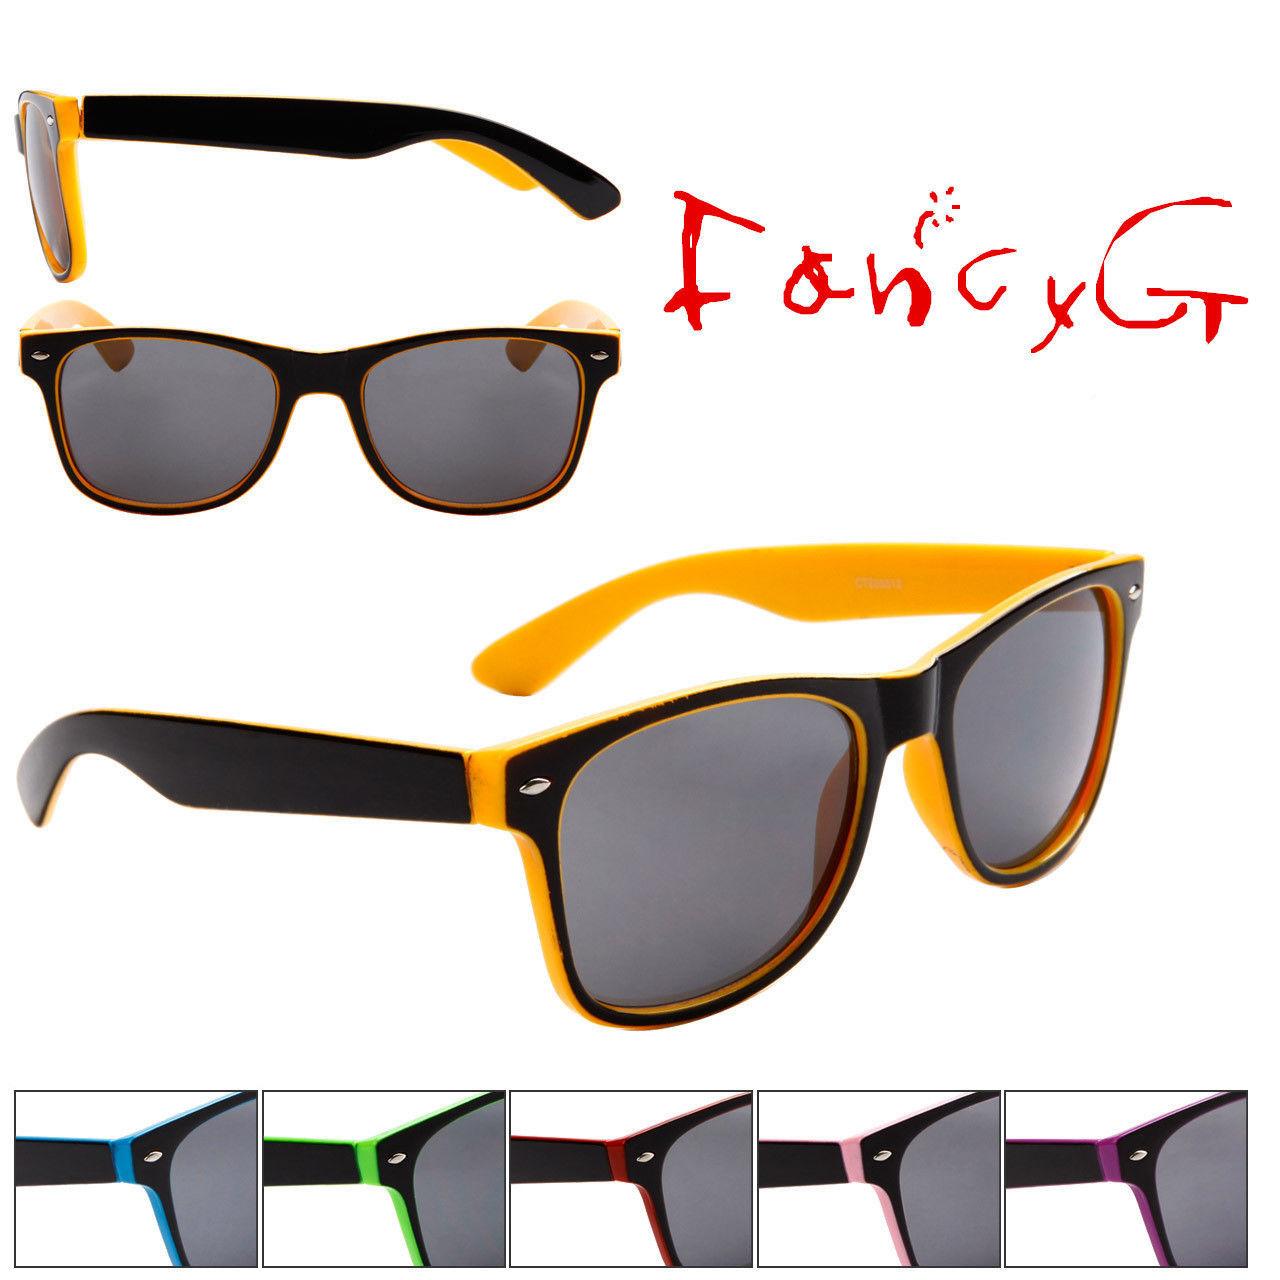 12 Assorted Fashion Sunglasses Unisex Classic Style UV 400 Protection